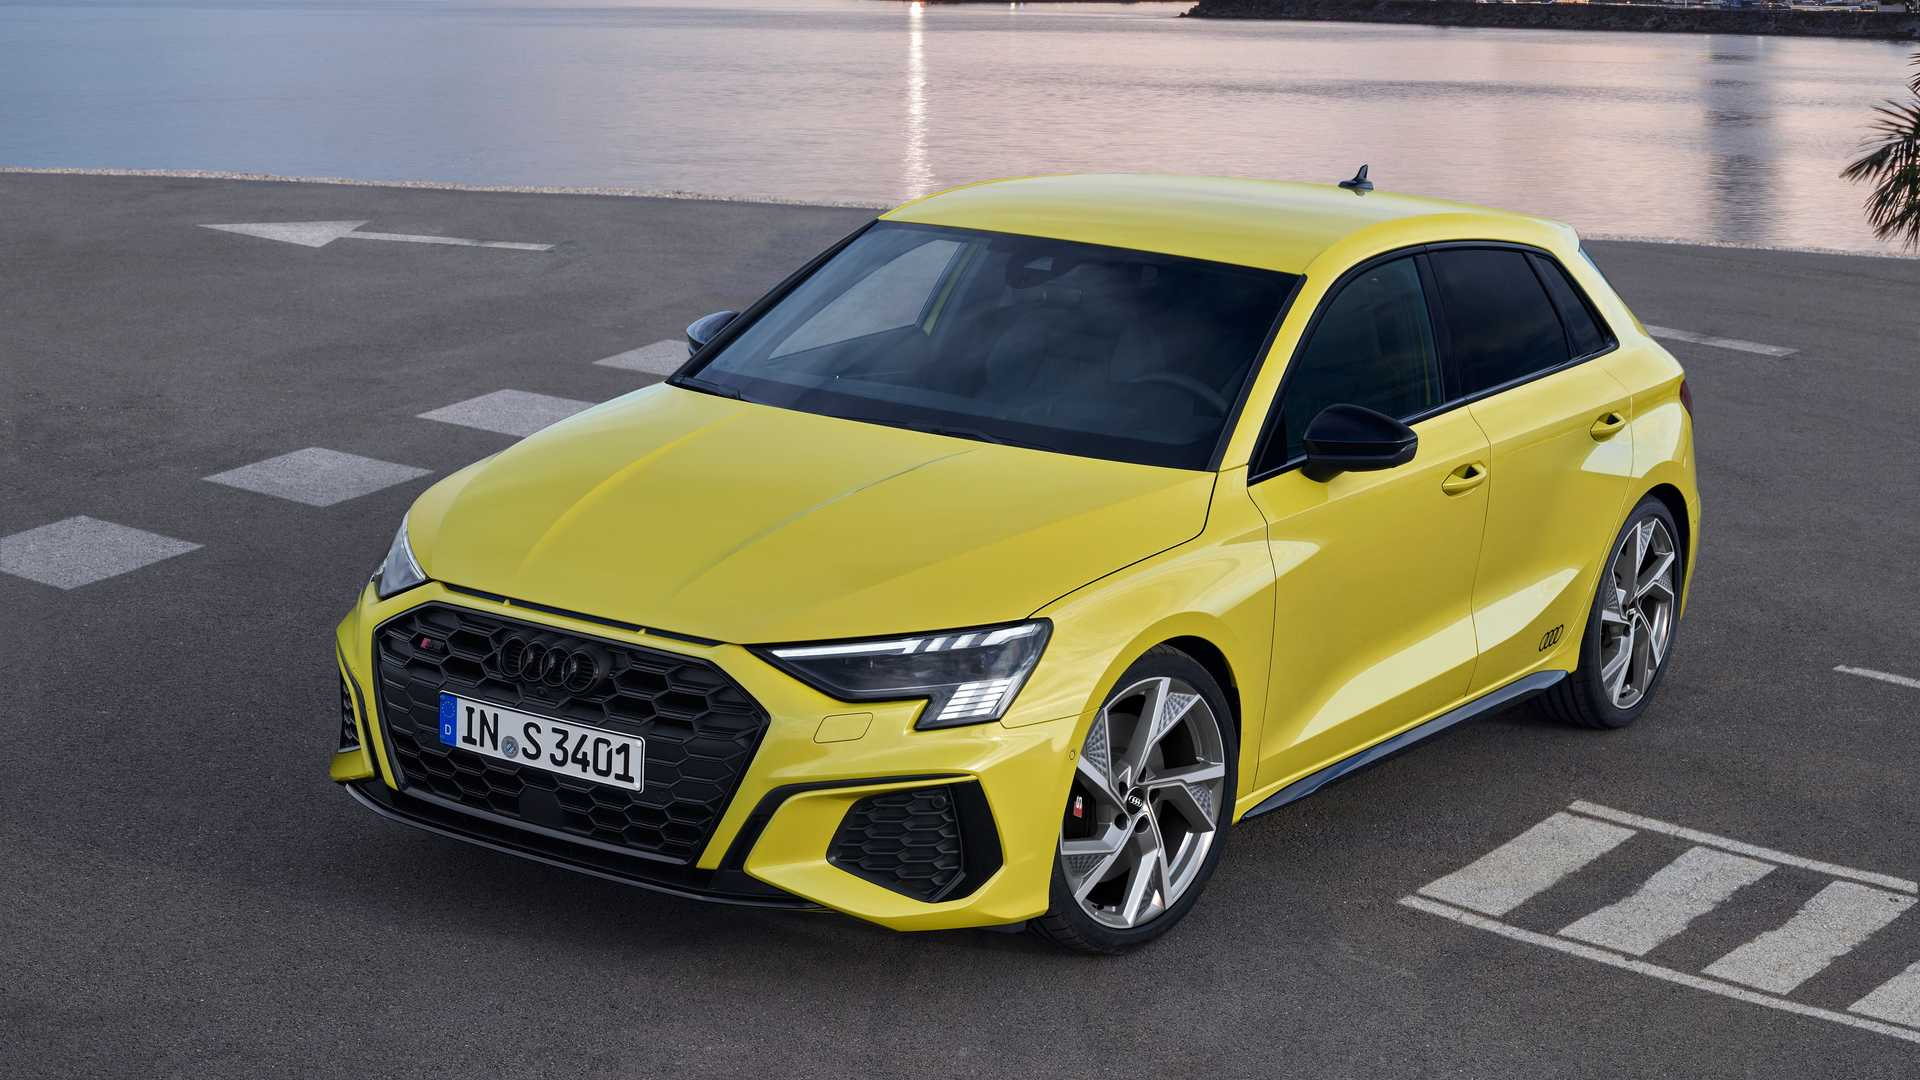 2021 Audi S3 Sportback And Sedan 306 HP 데이다주의 : 클리앙